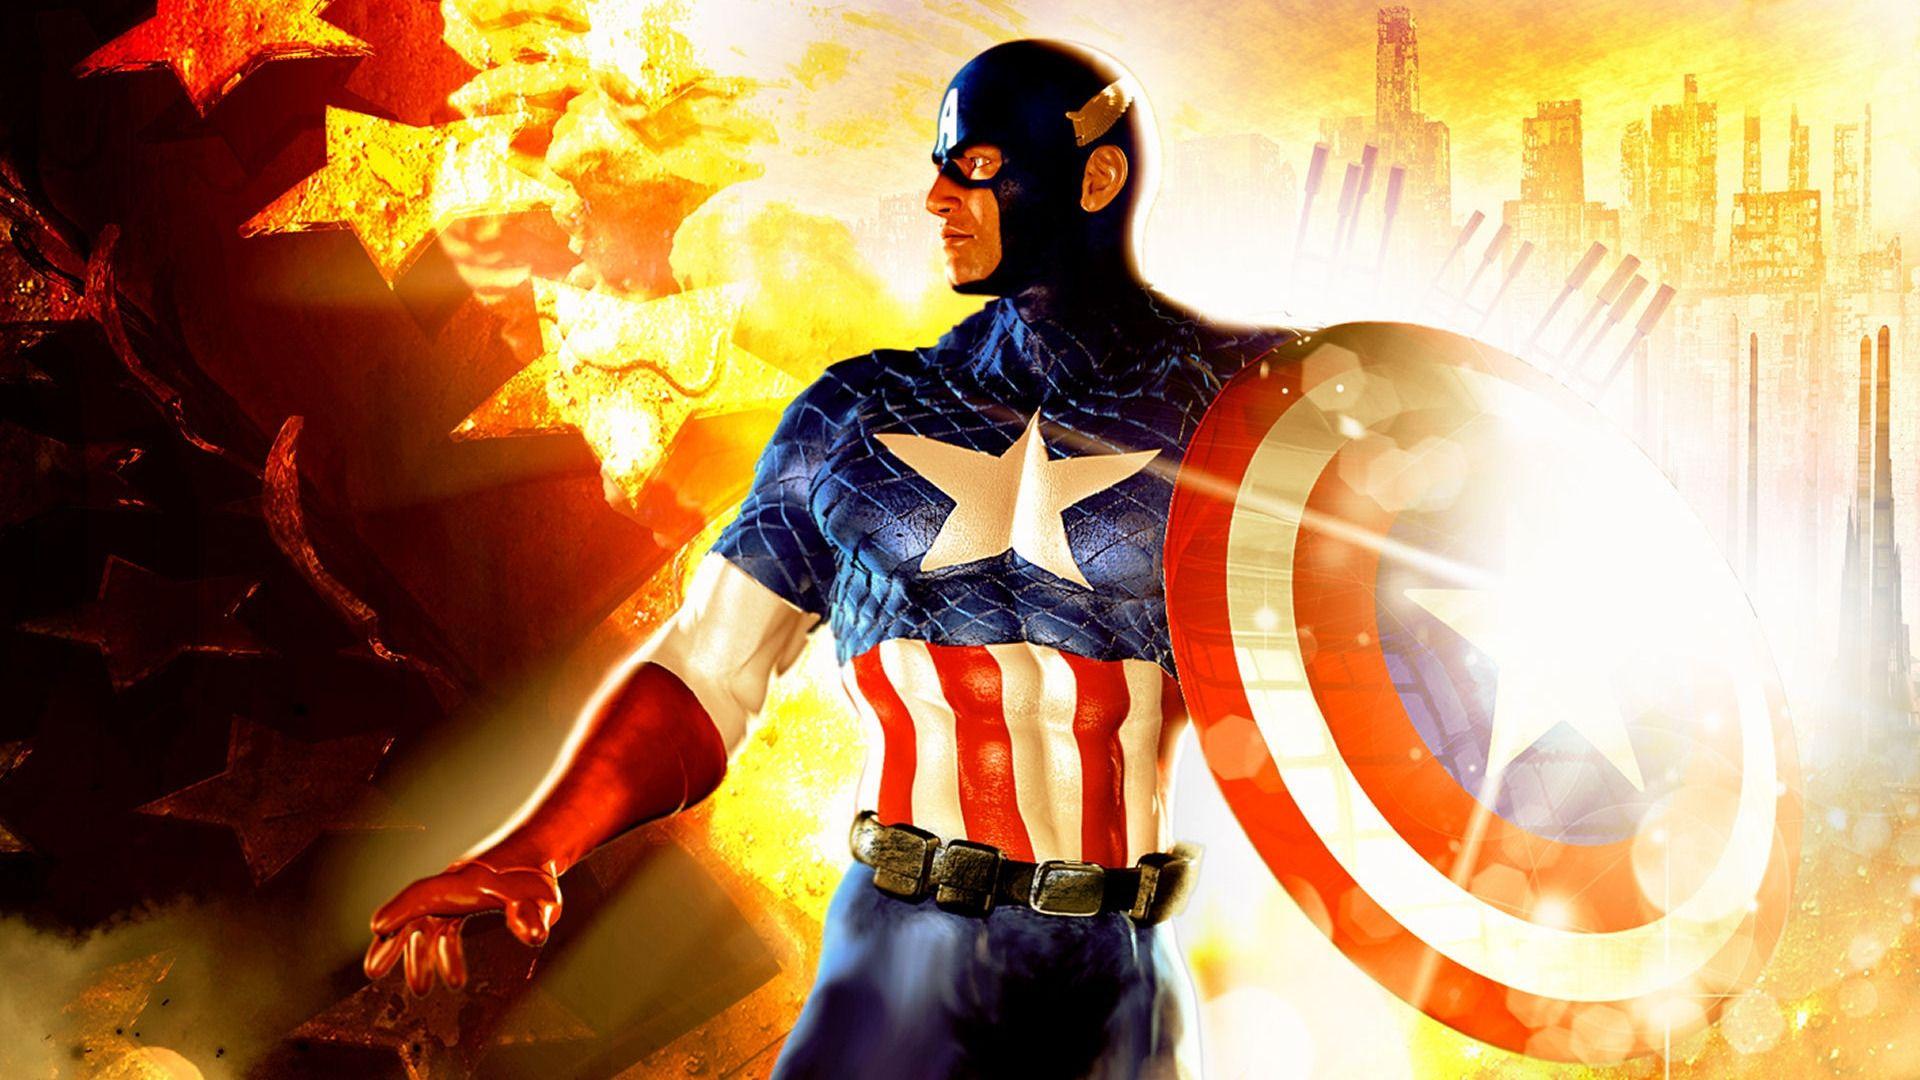 America Wallpaper captain america hd wallpapers free download 1920×1080 captain